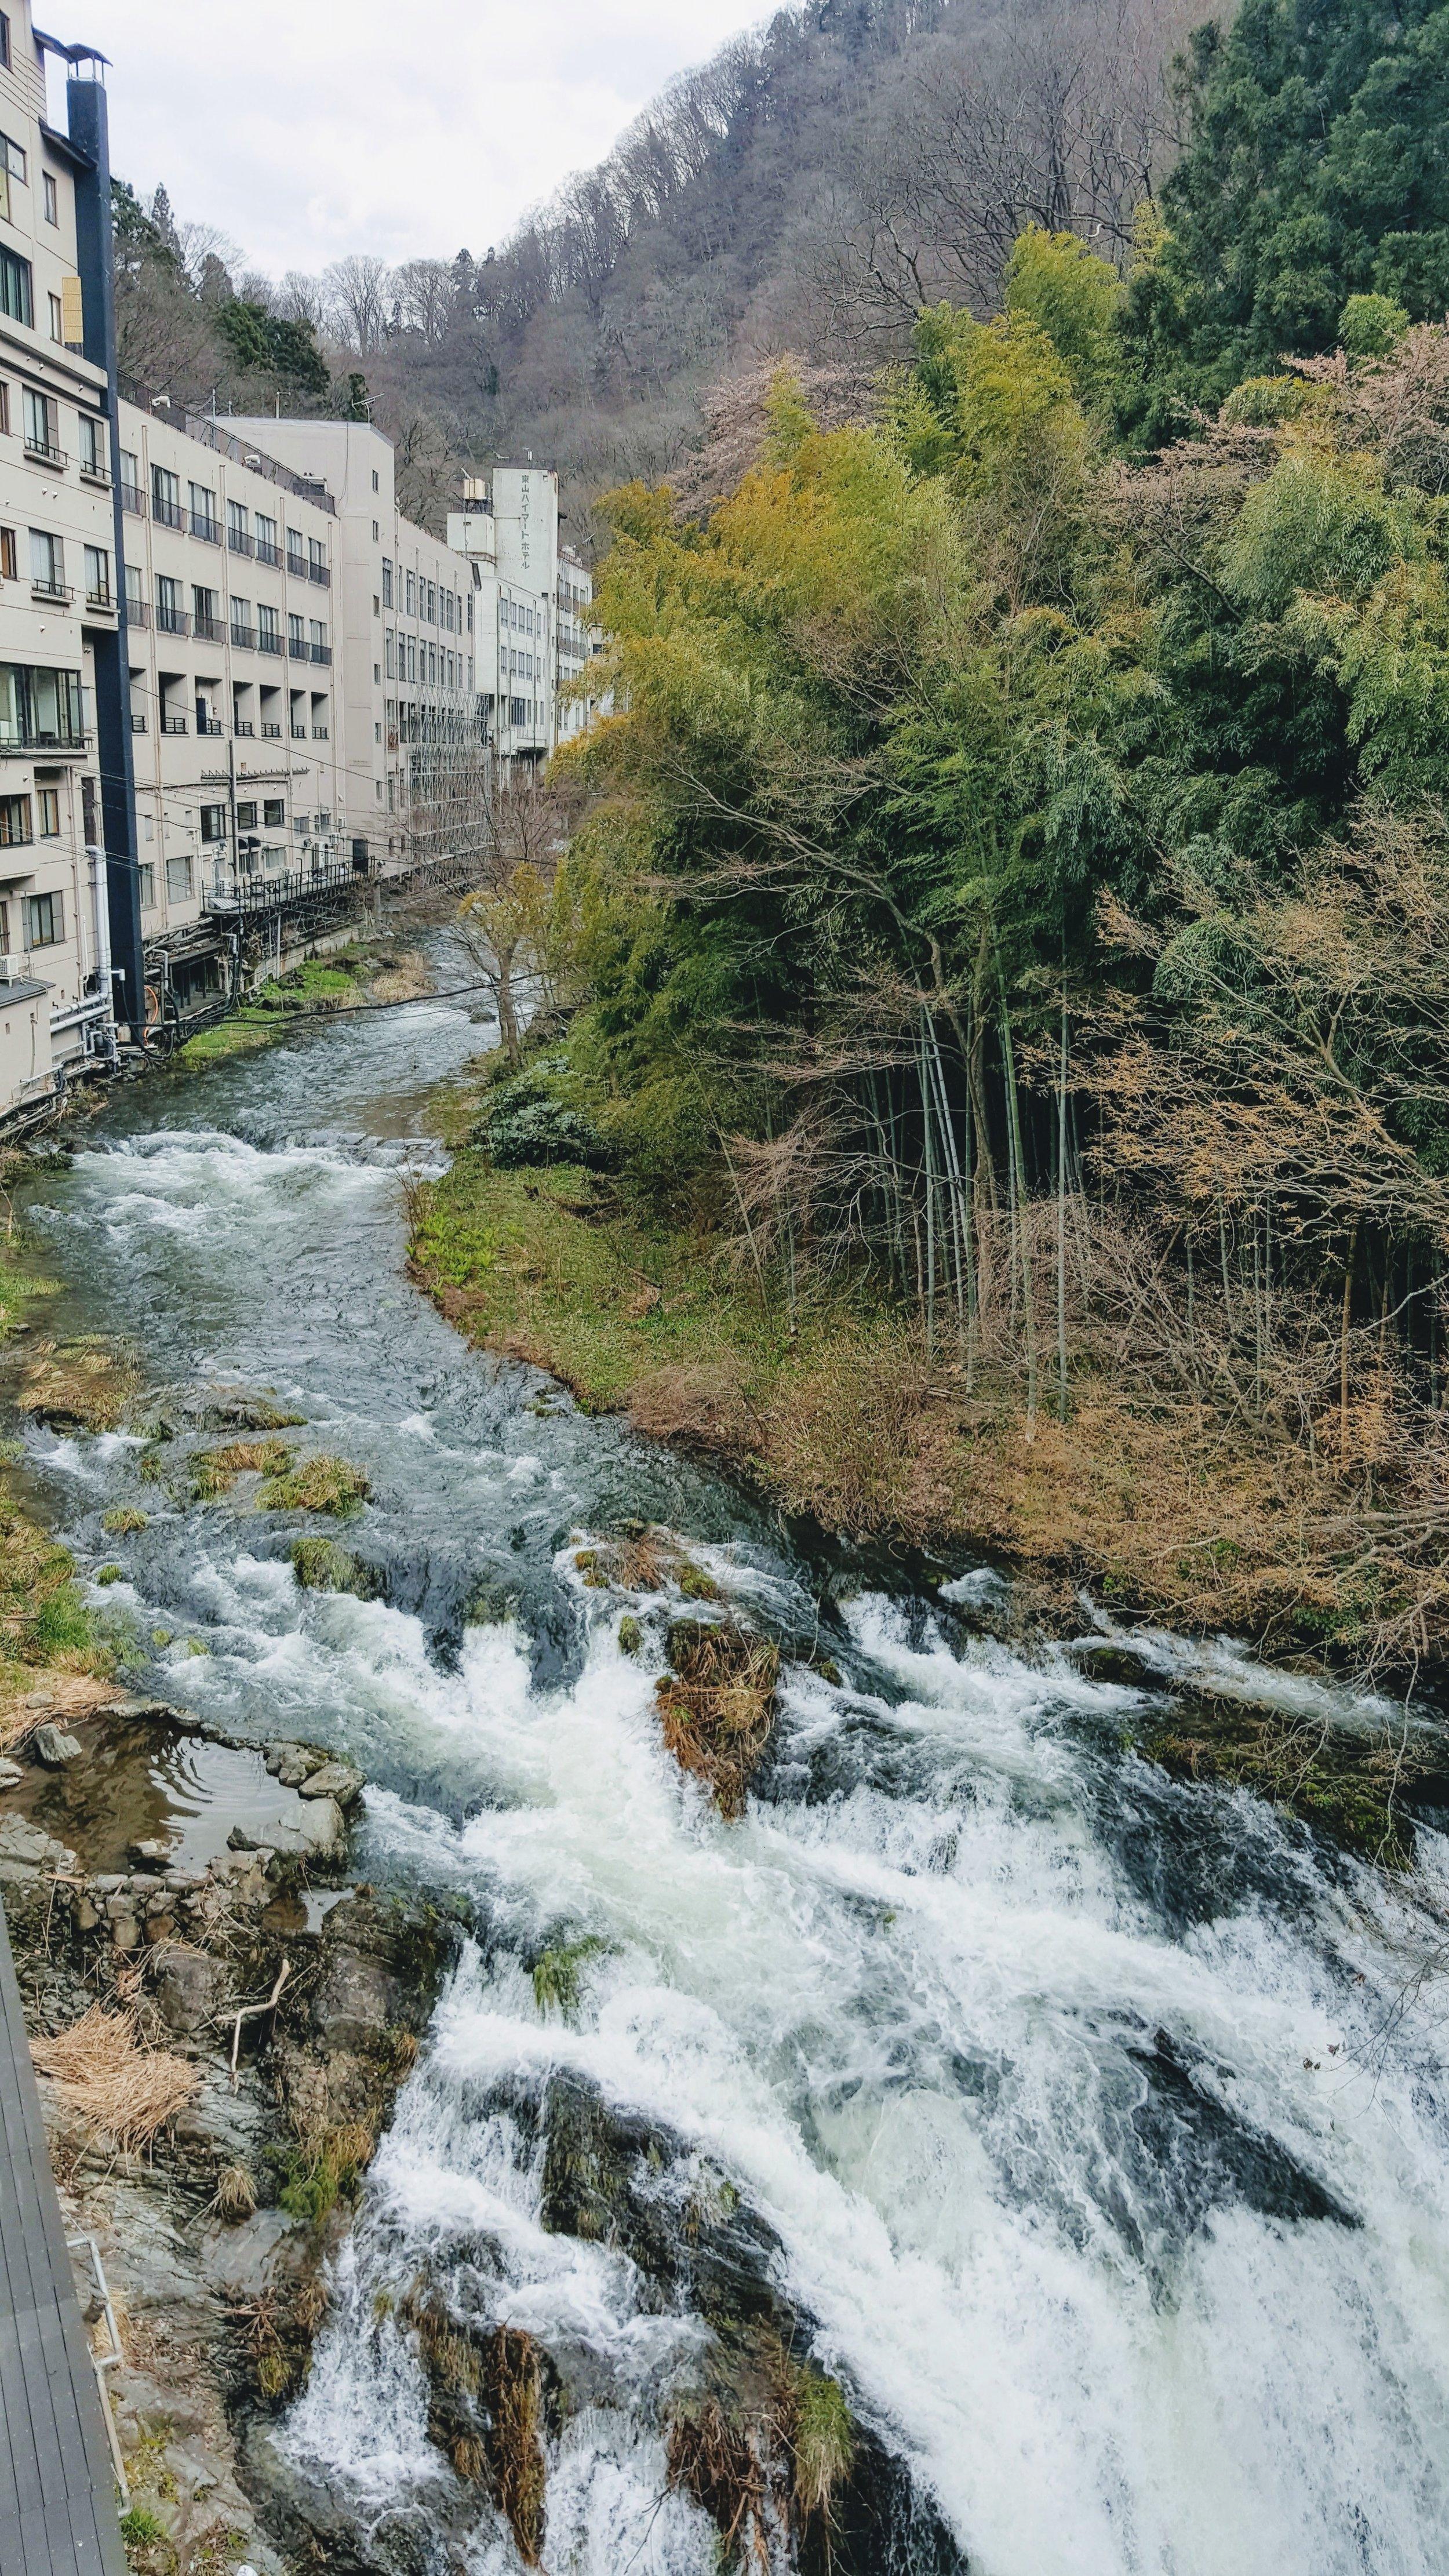 Listen to the sound of the river stream at Shousuke no Yado Takinoyu